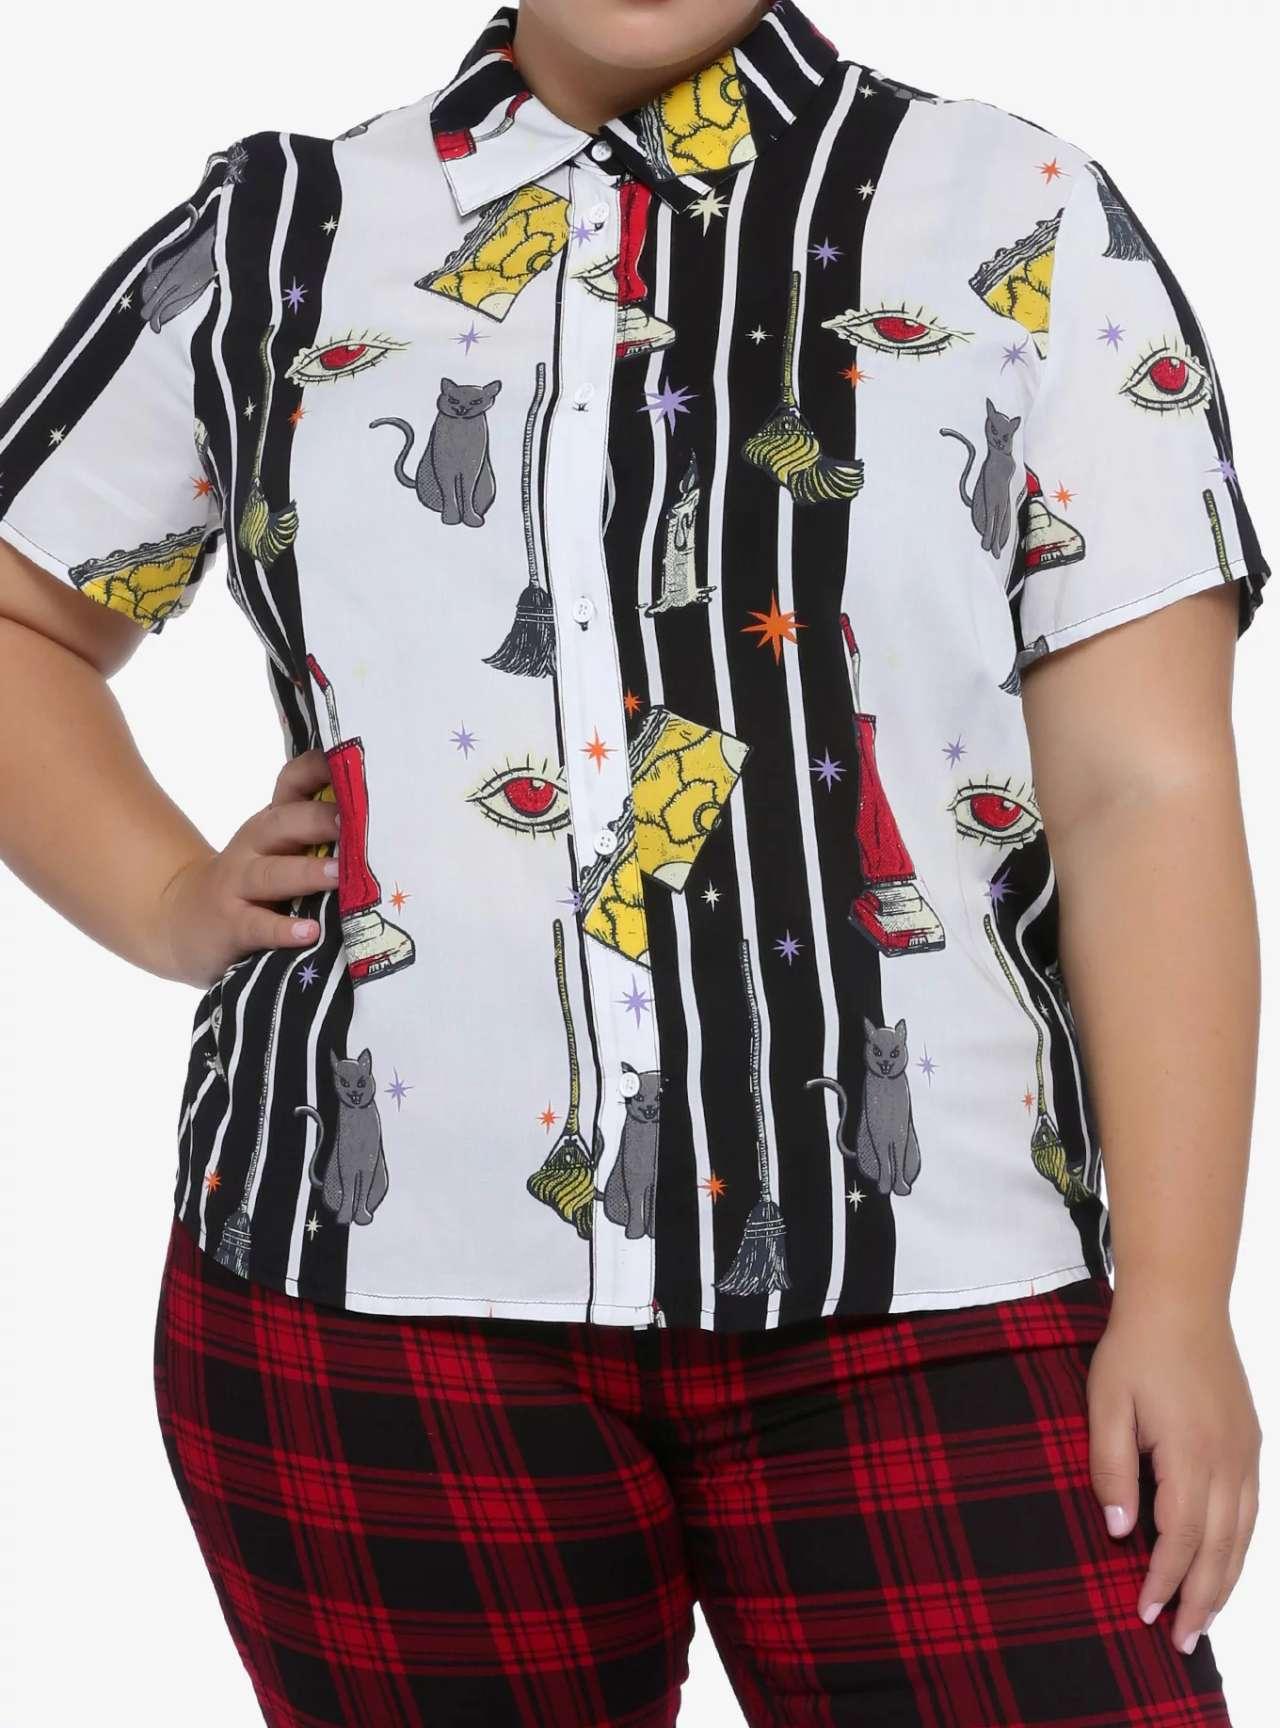 hocus-pocus-button-up-shirt